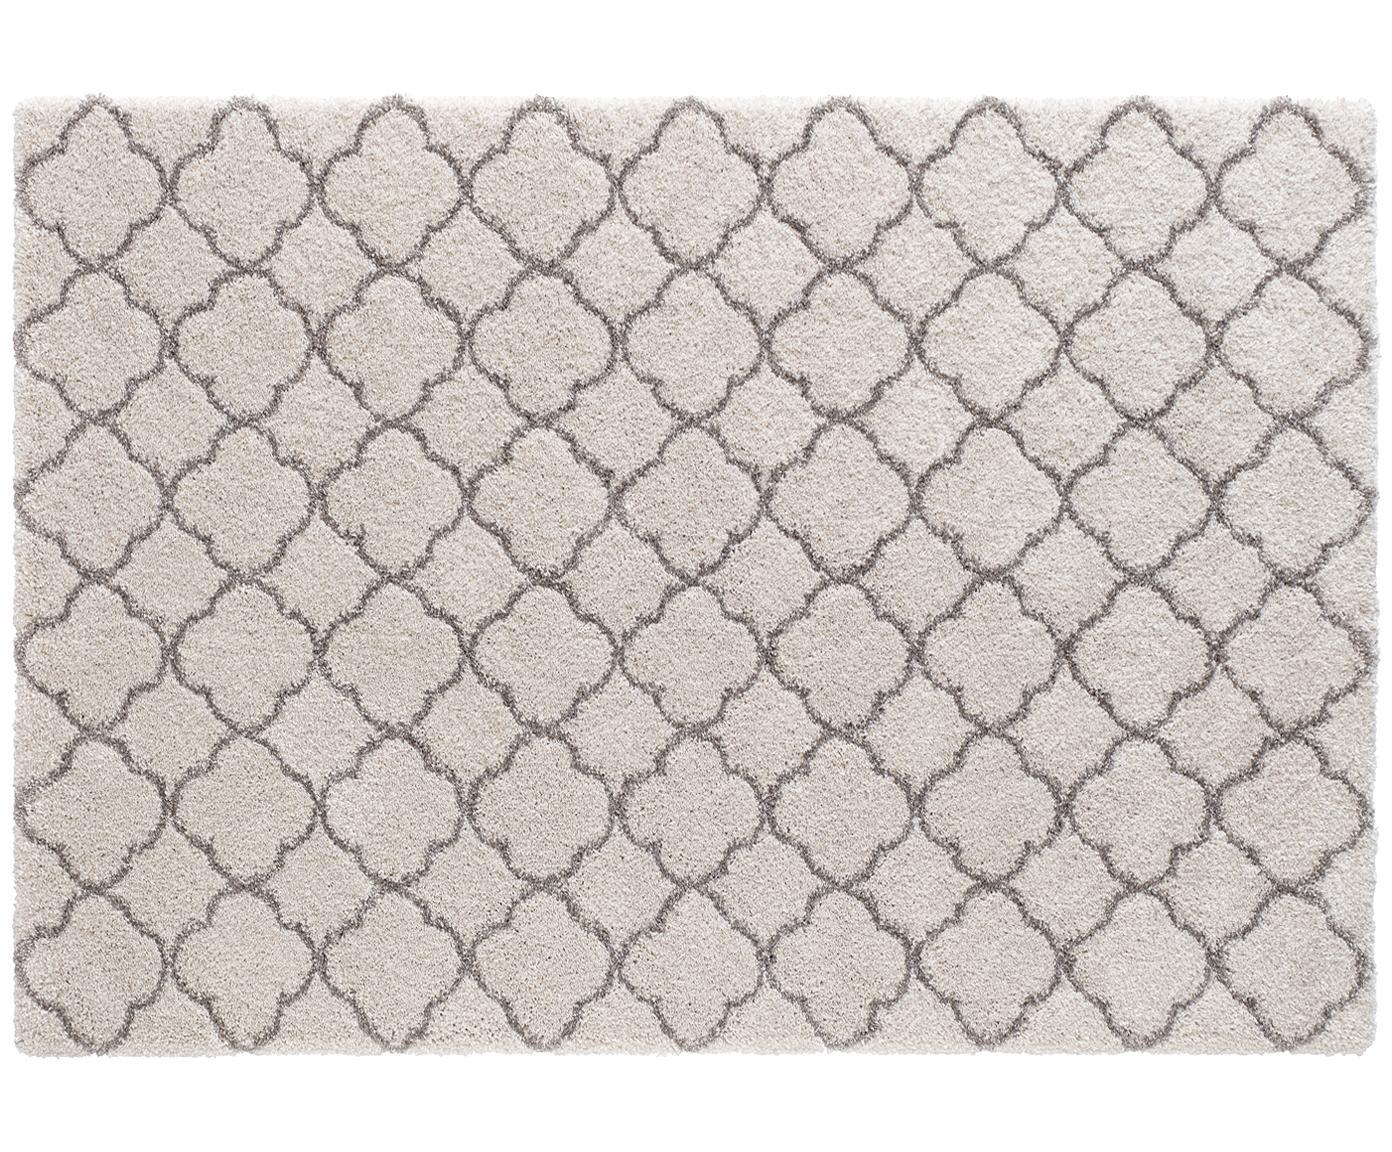 Hochflor-Teppich Grace in Creme/Grau, Flor: 100% Polypropylen, Creme, Grau, B 160 x L 230 cm (Grösse M)